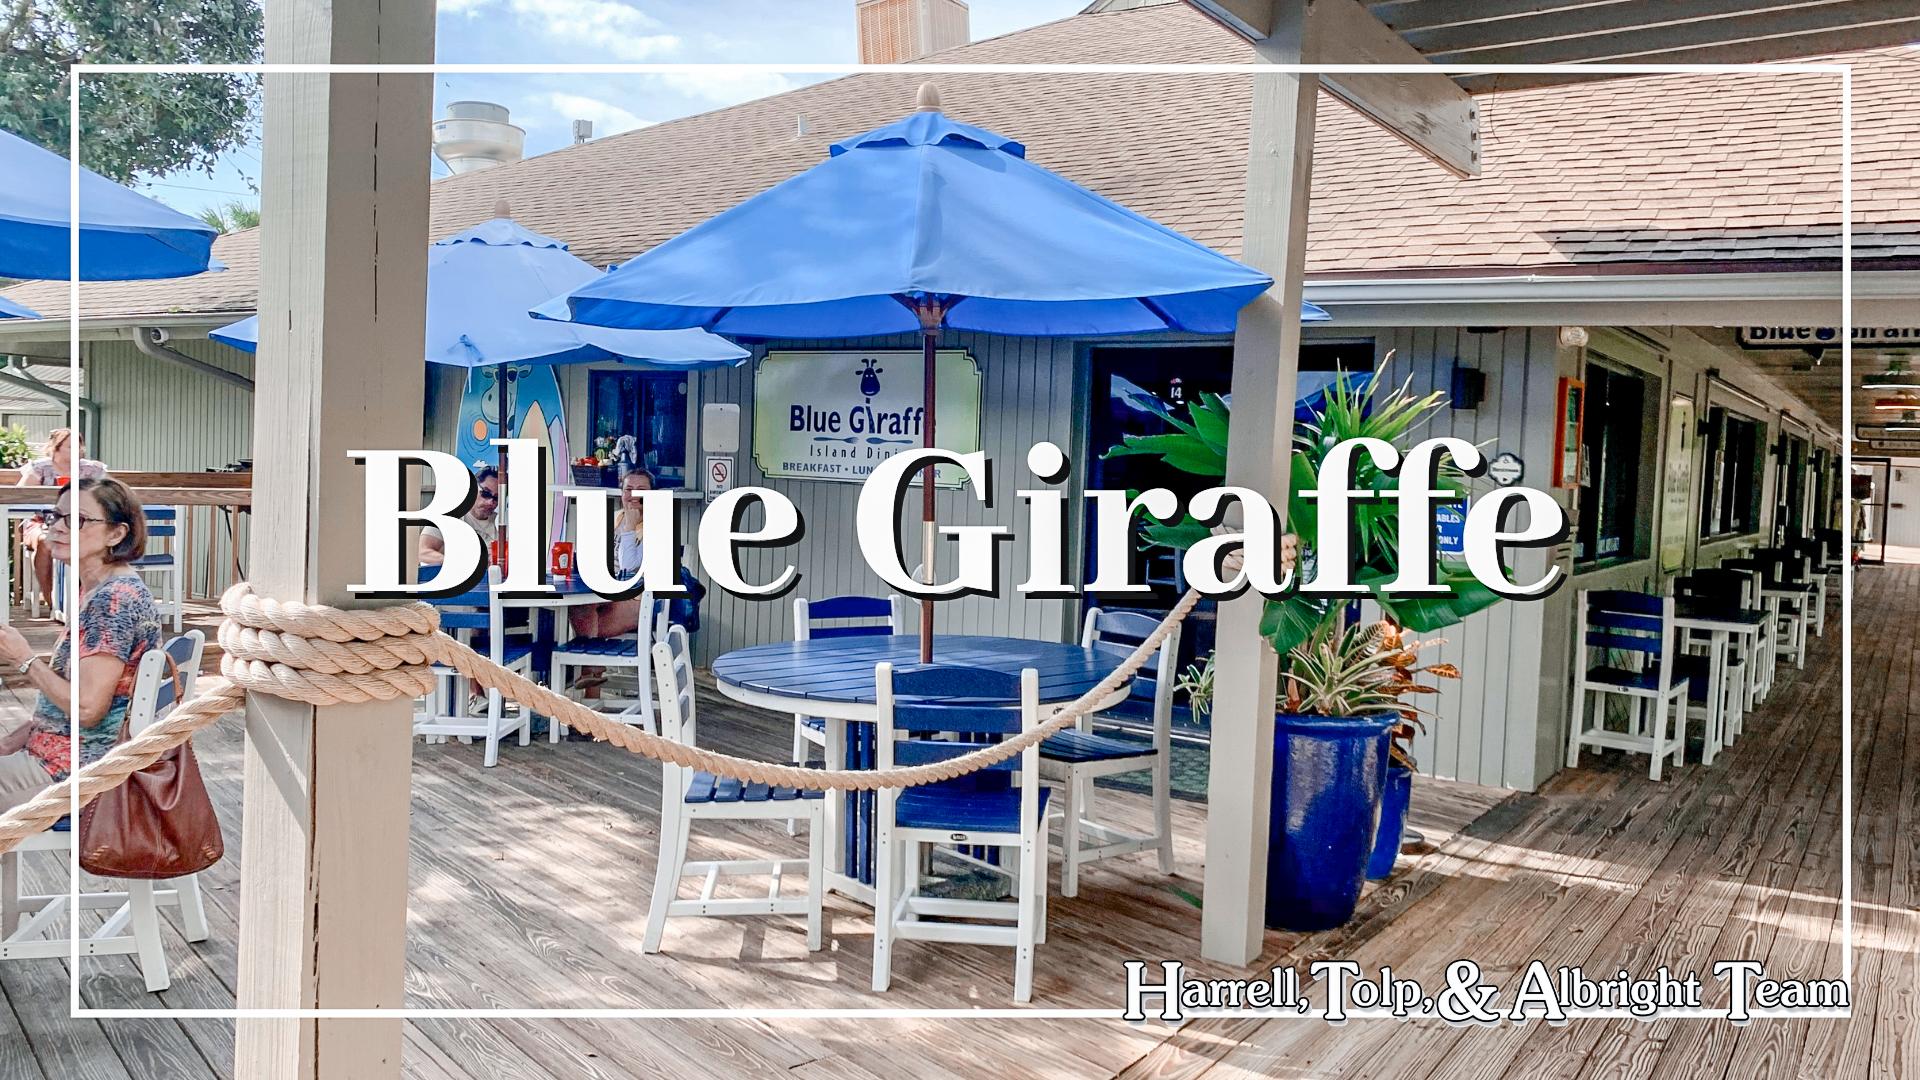 Blue Giraffe Periwinkle Place